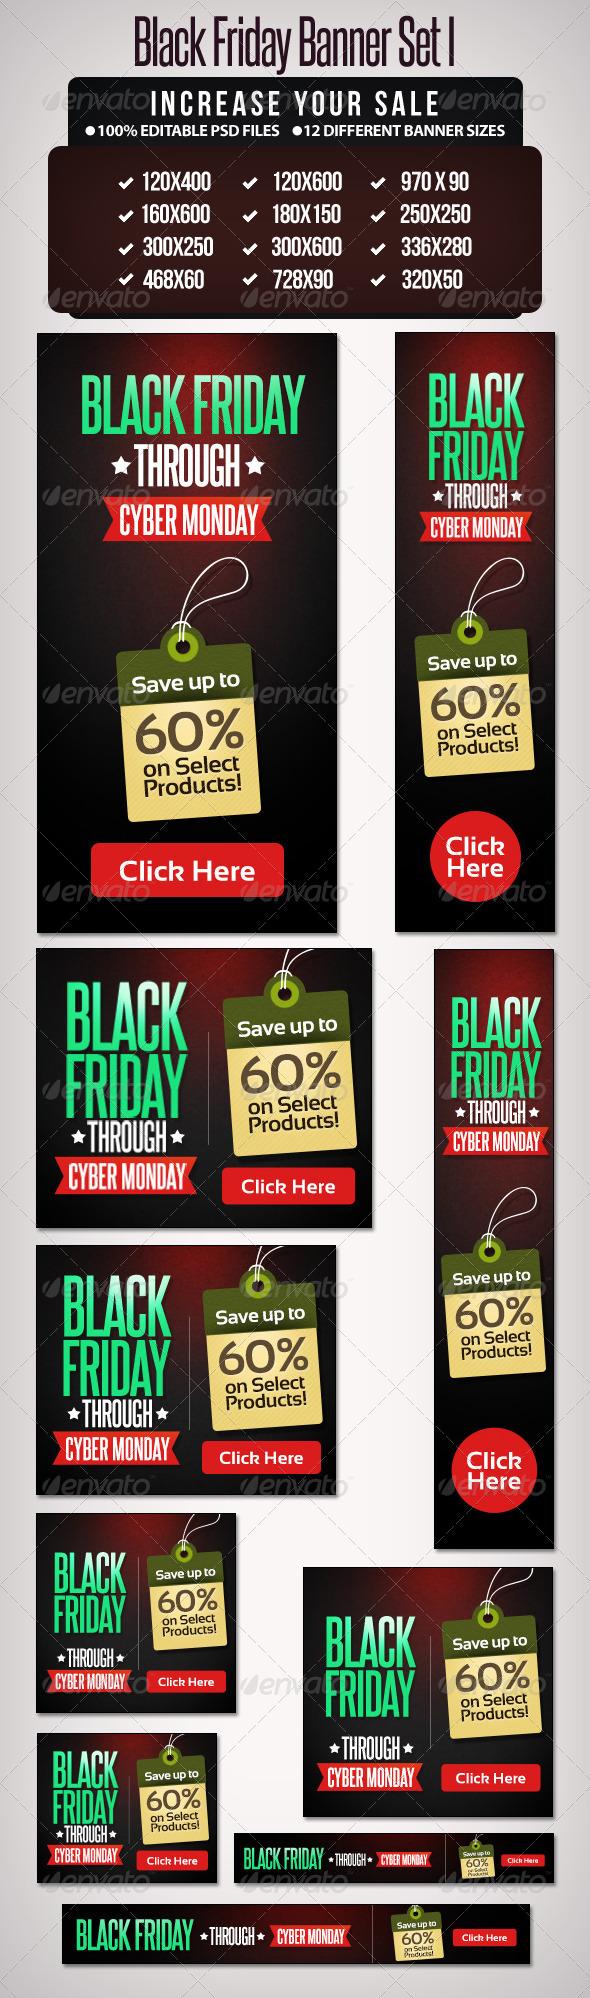 Black Friday Banner Set - 1  - Banners & Ads Web Elements